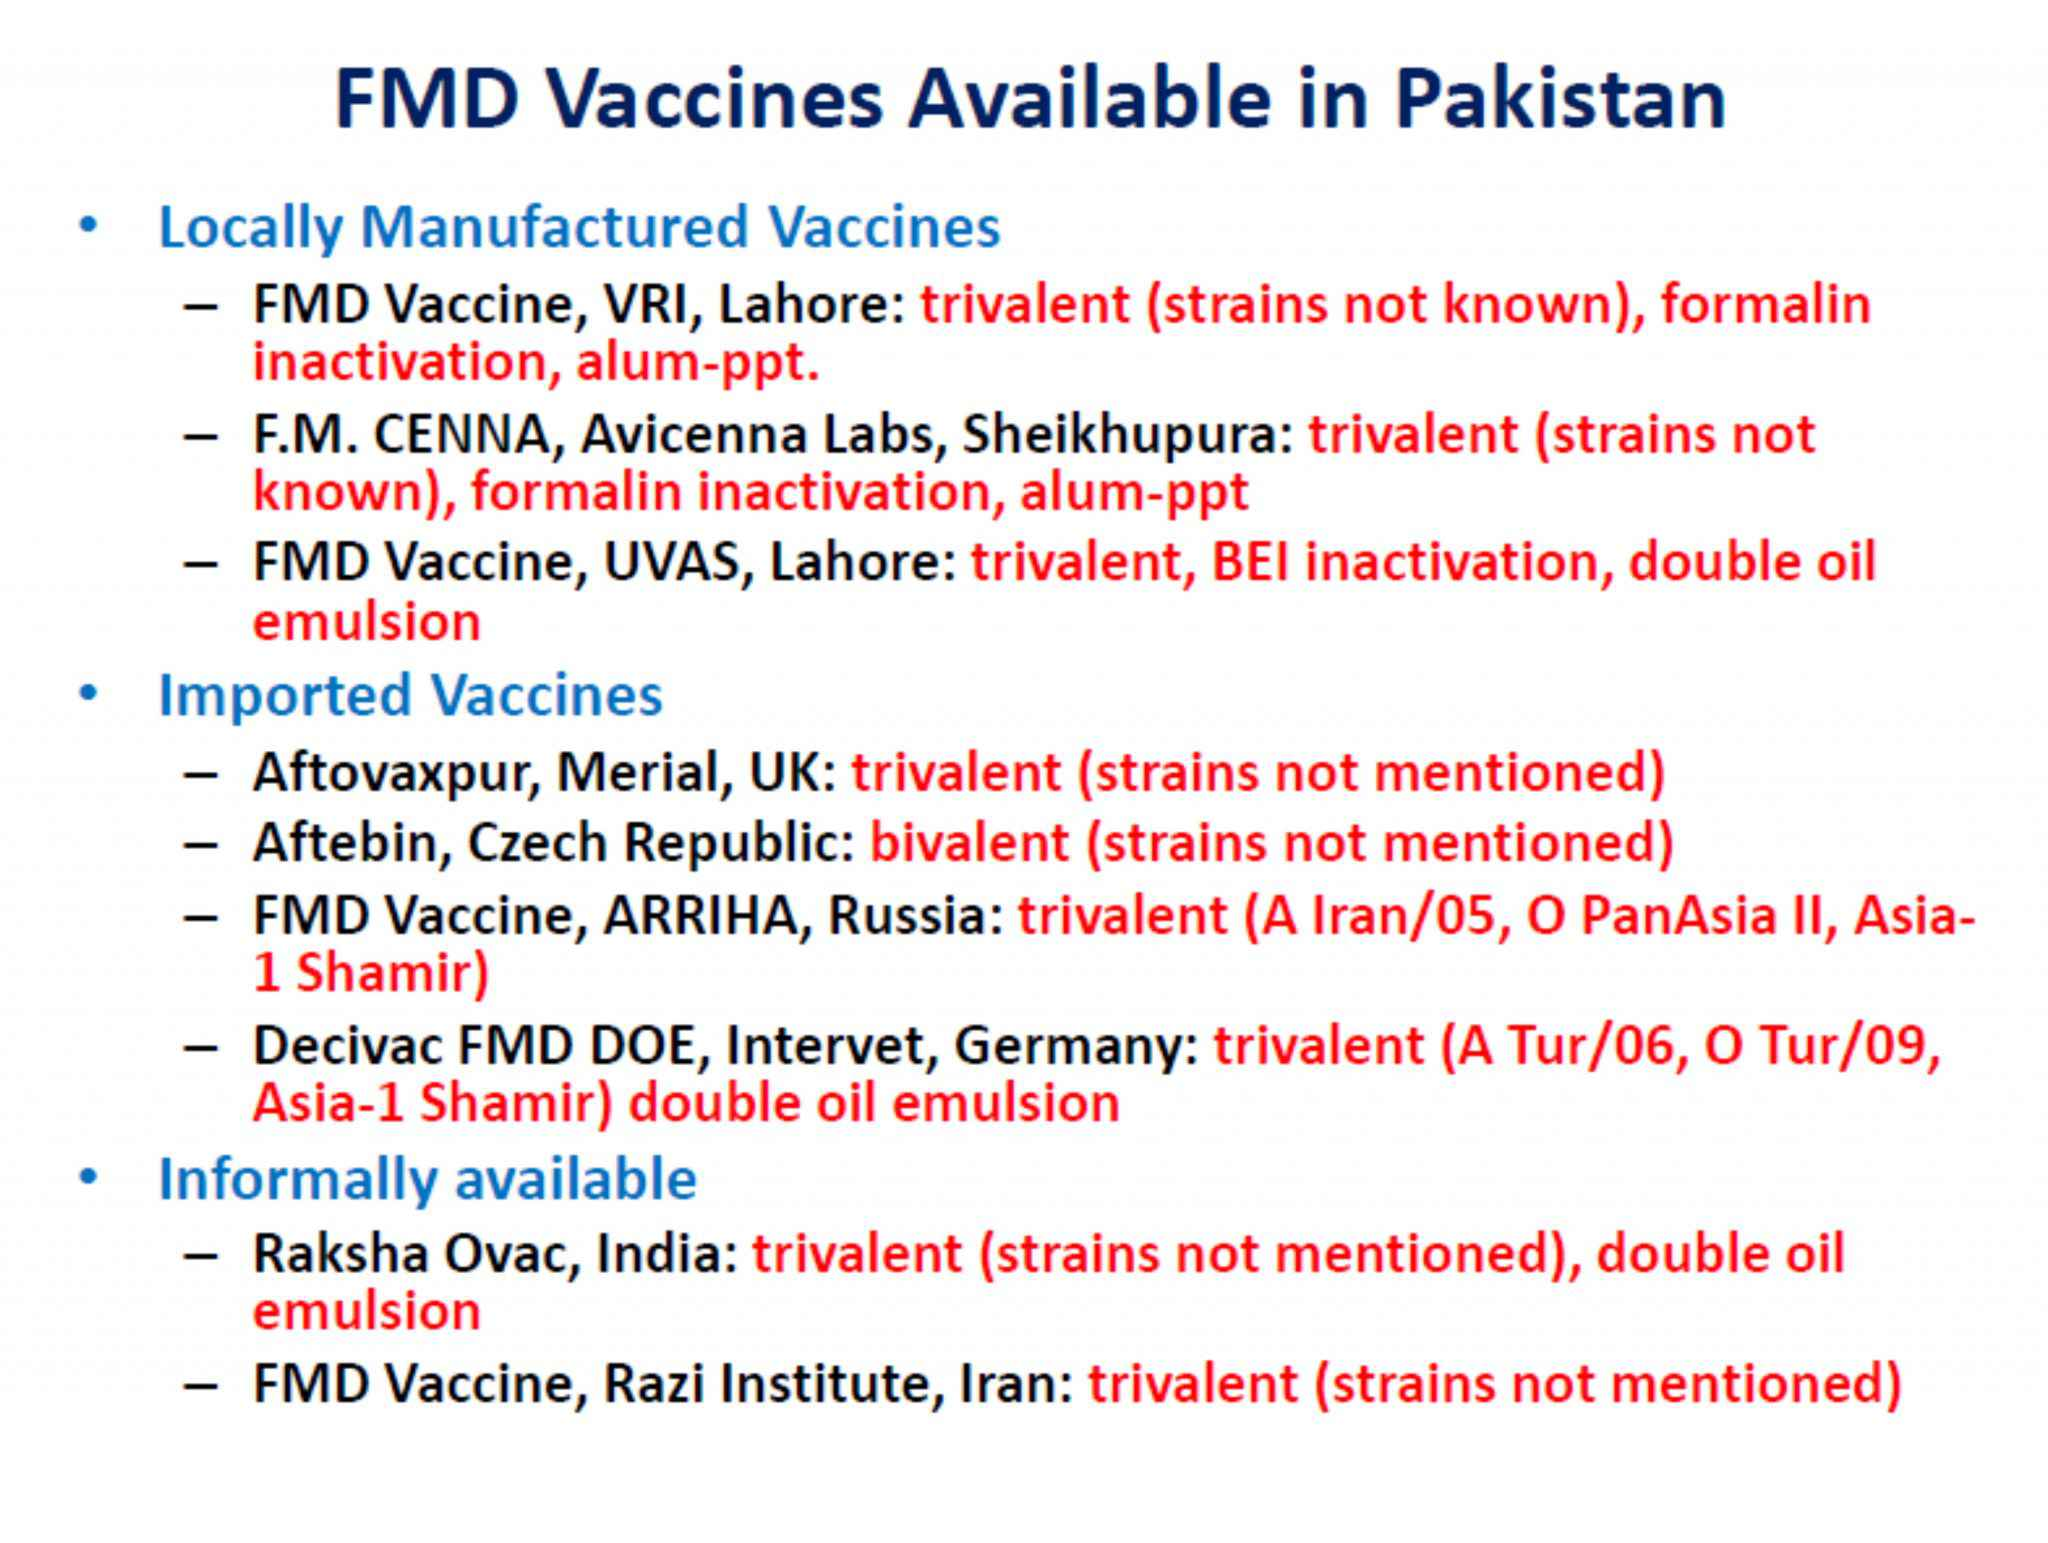 FMD Vaccines Worldwide